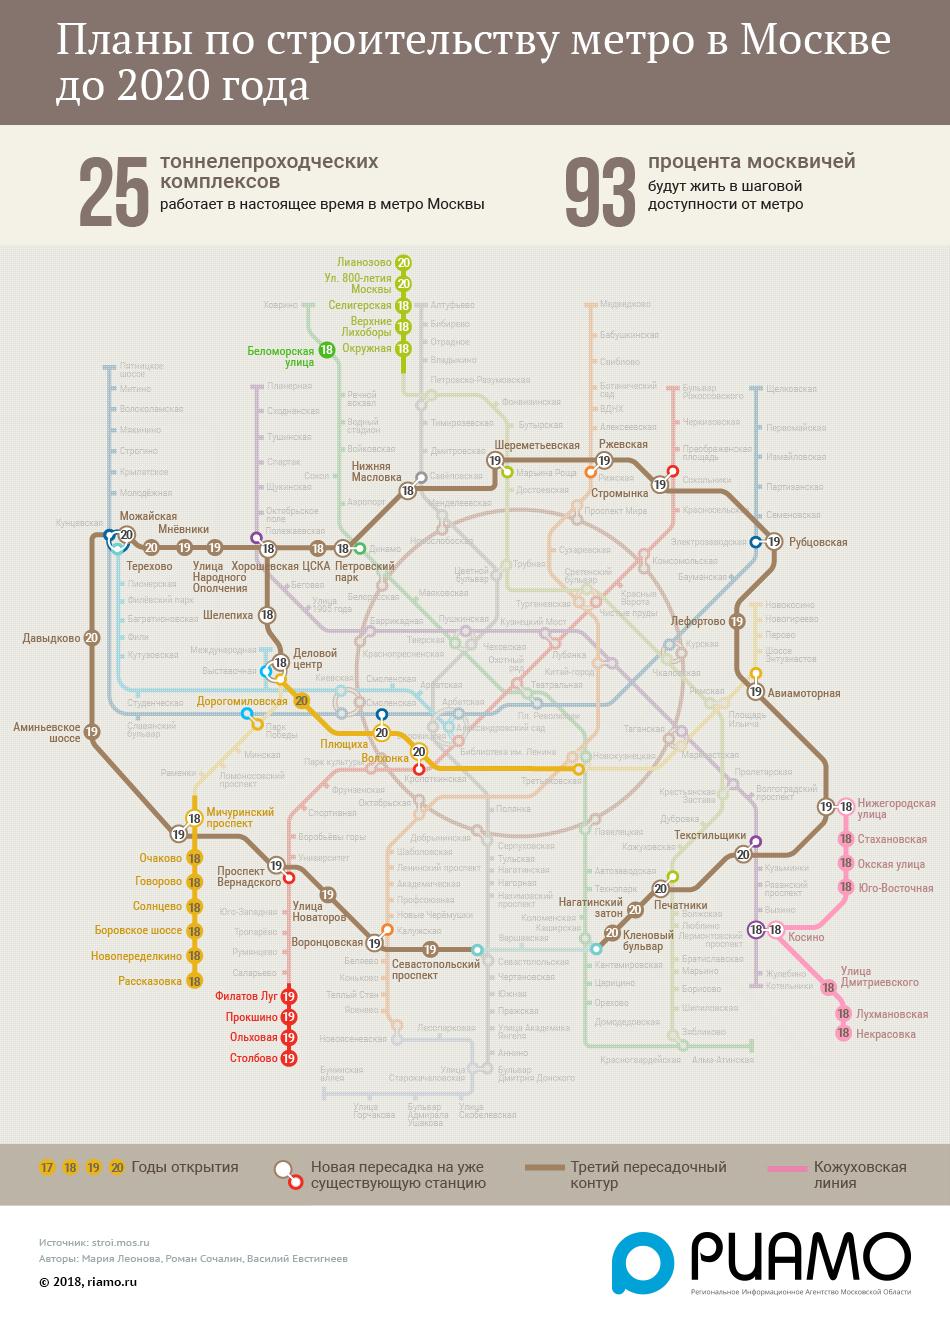 Какие станции метро откроют до 2020 года